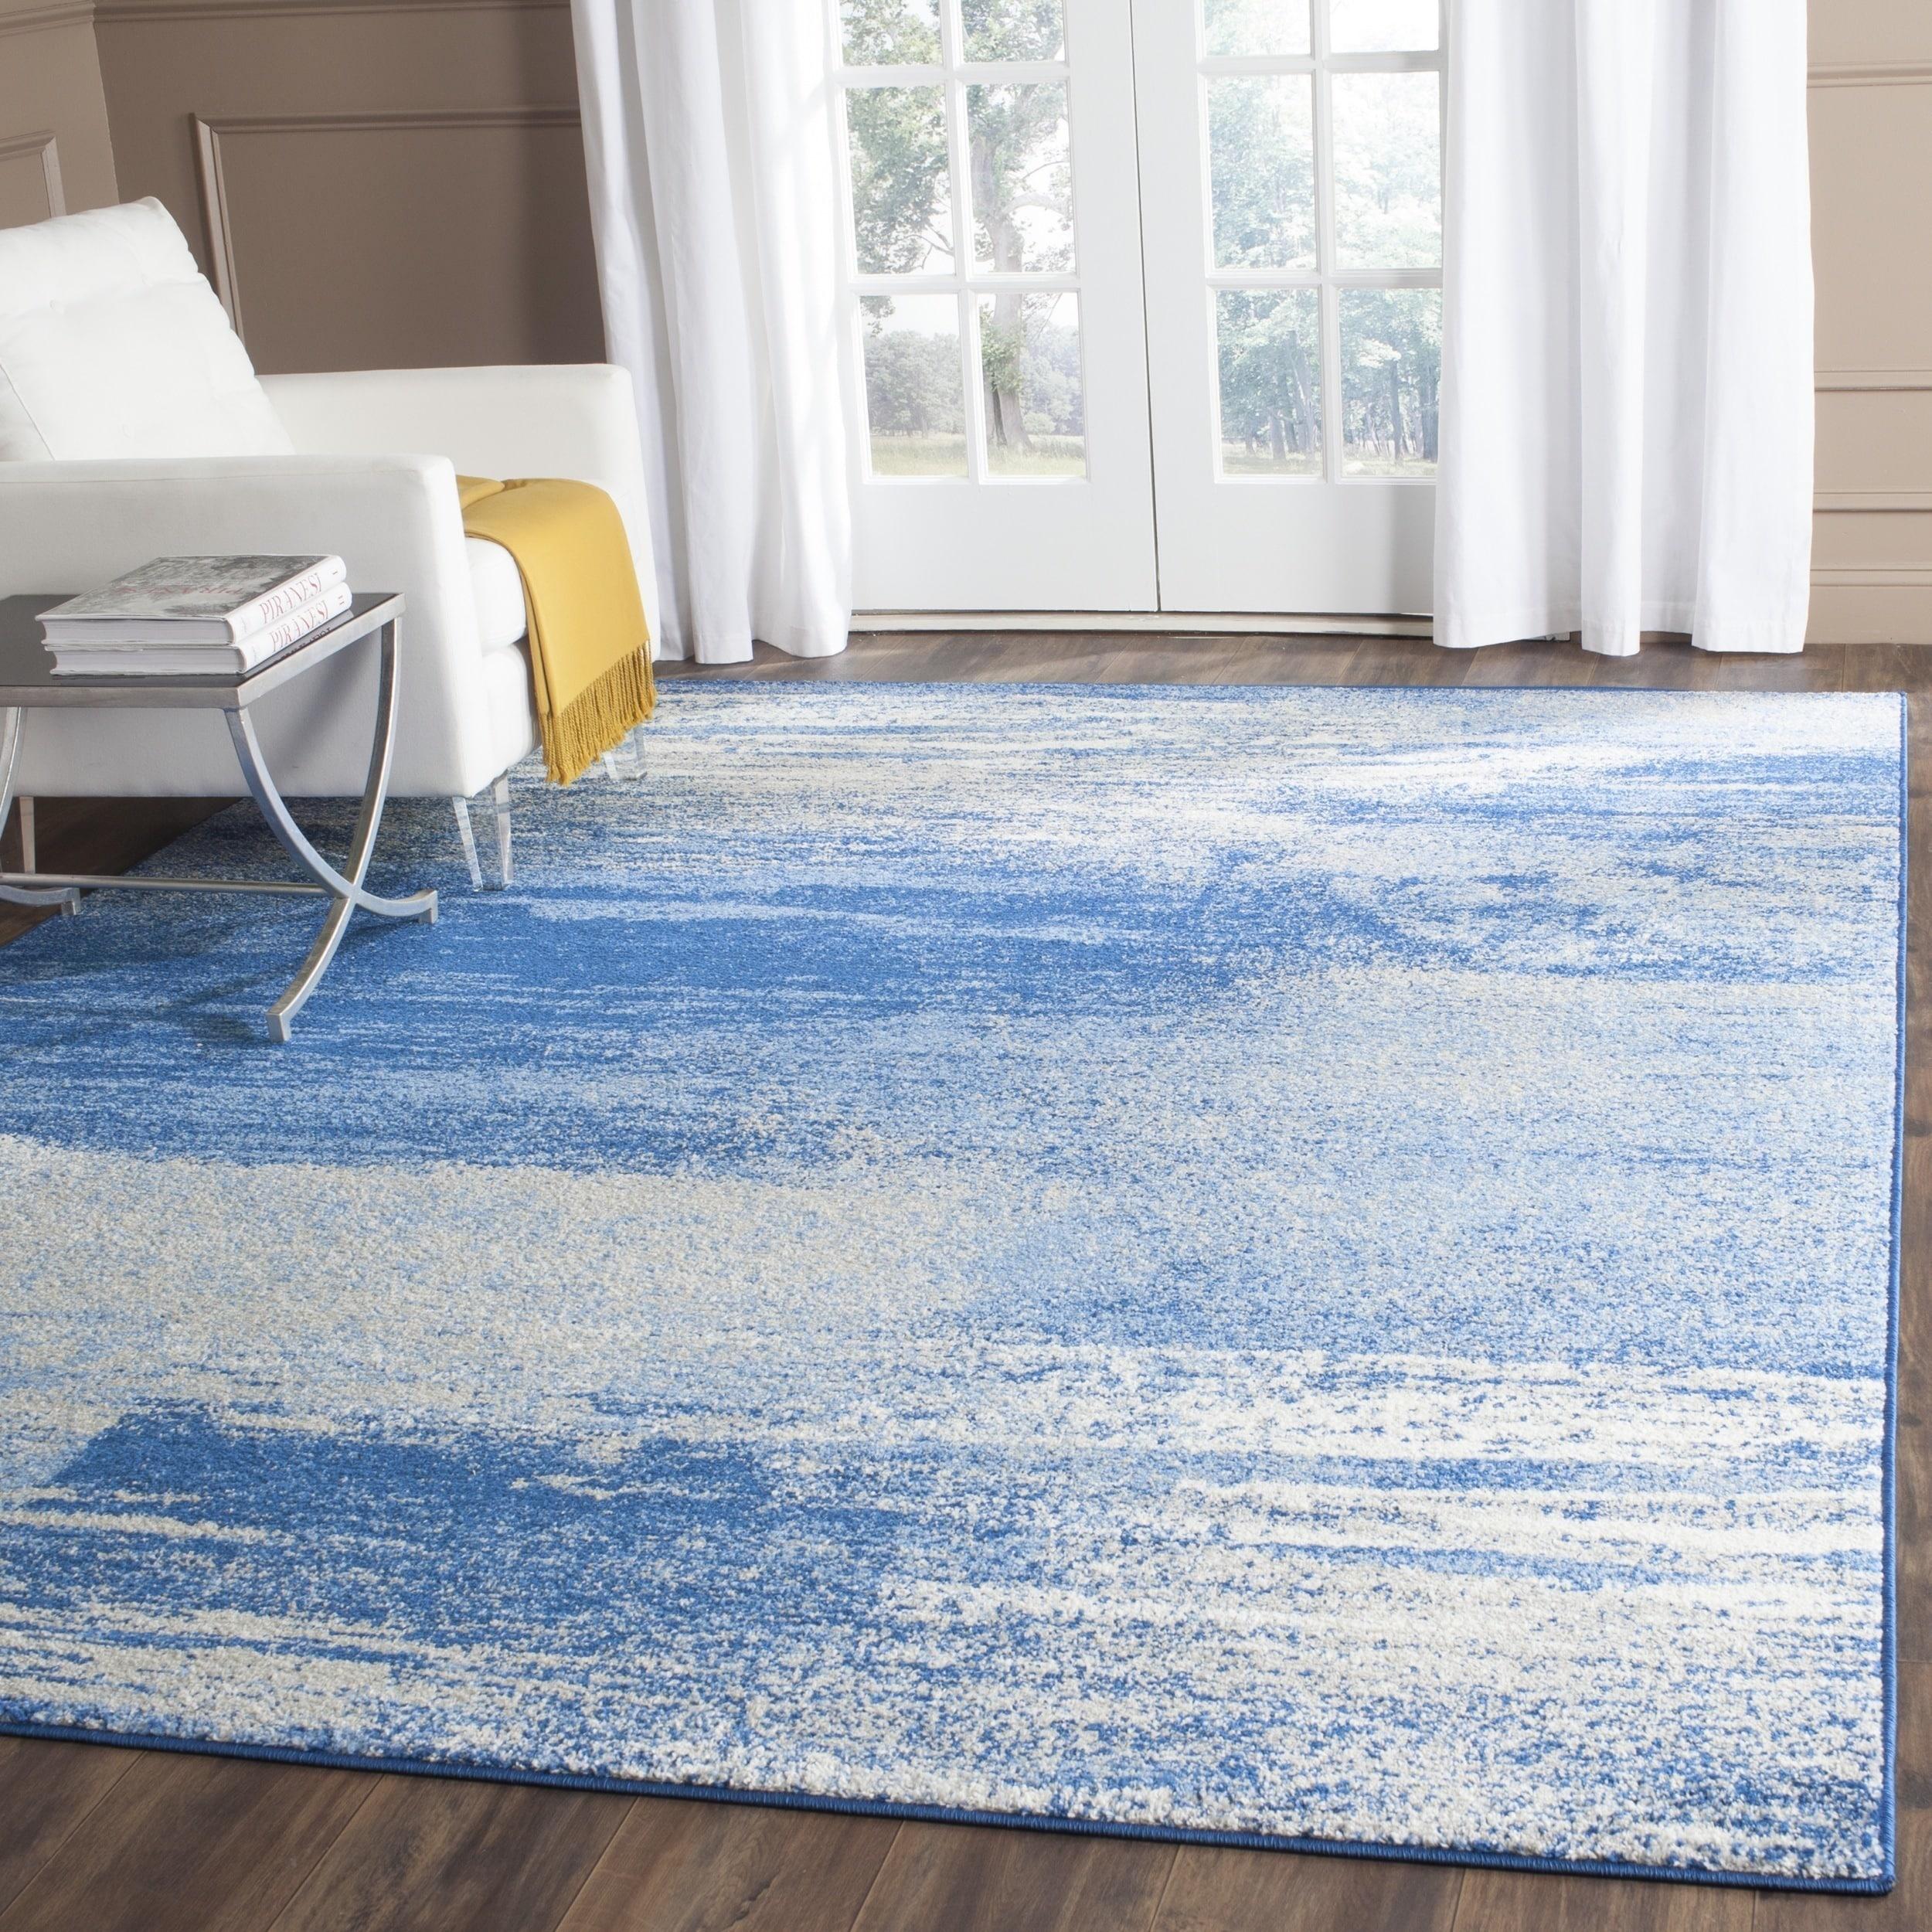 Safavieh Adirondack Modern Abstract Silver Blue Rug 8 x 10